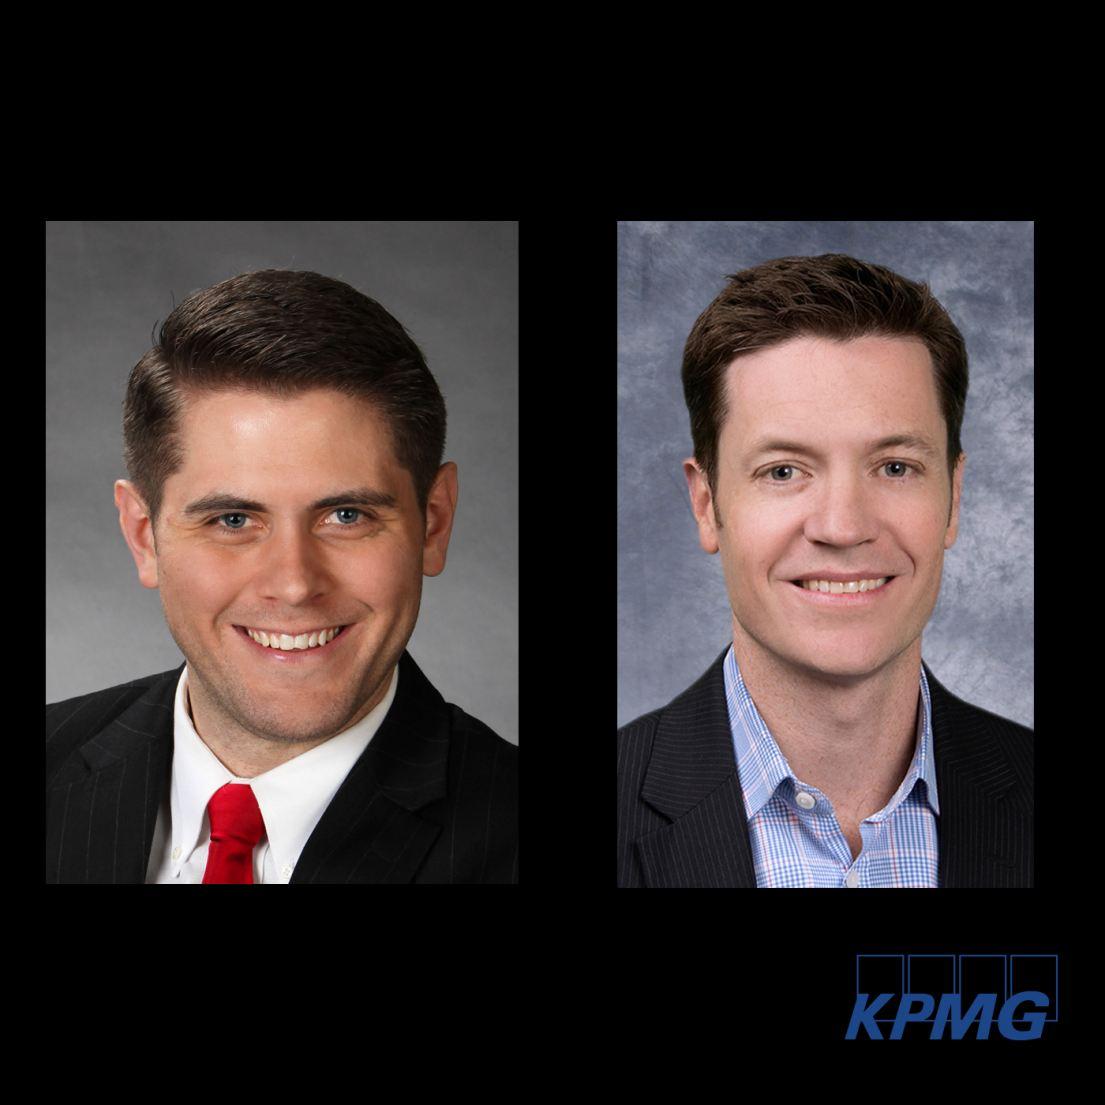 Brian Radakovich and Thomas Haslam, KPMG